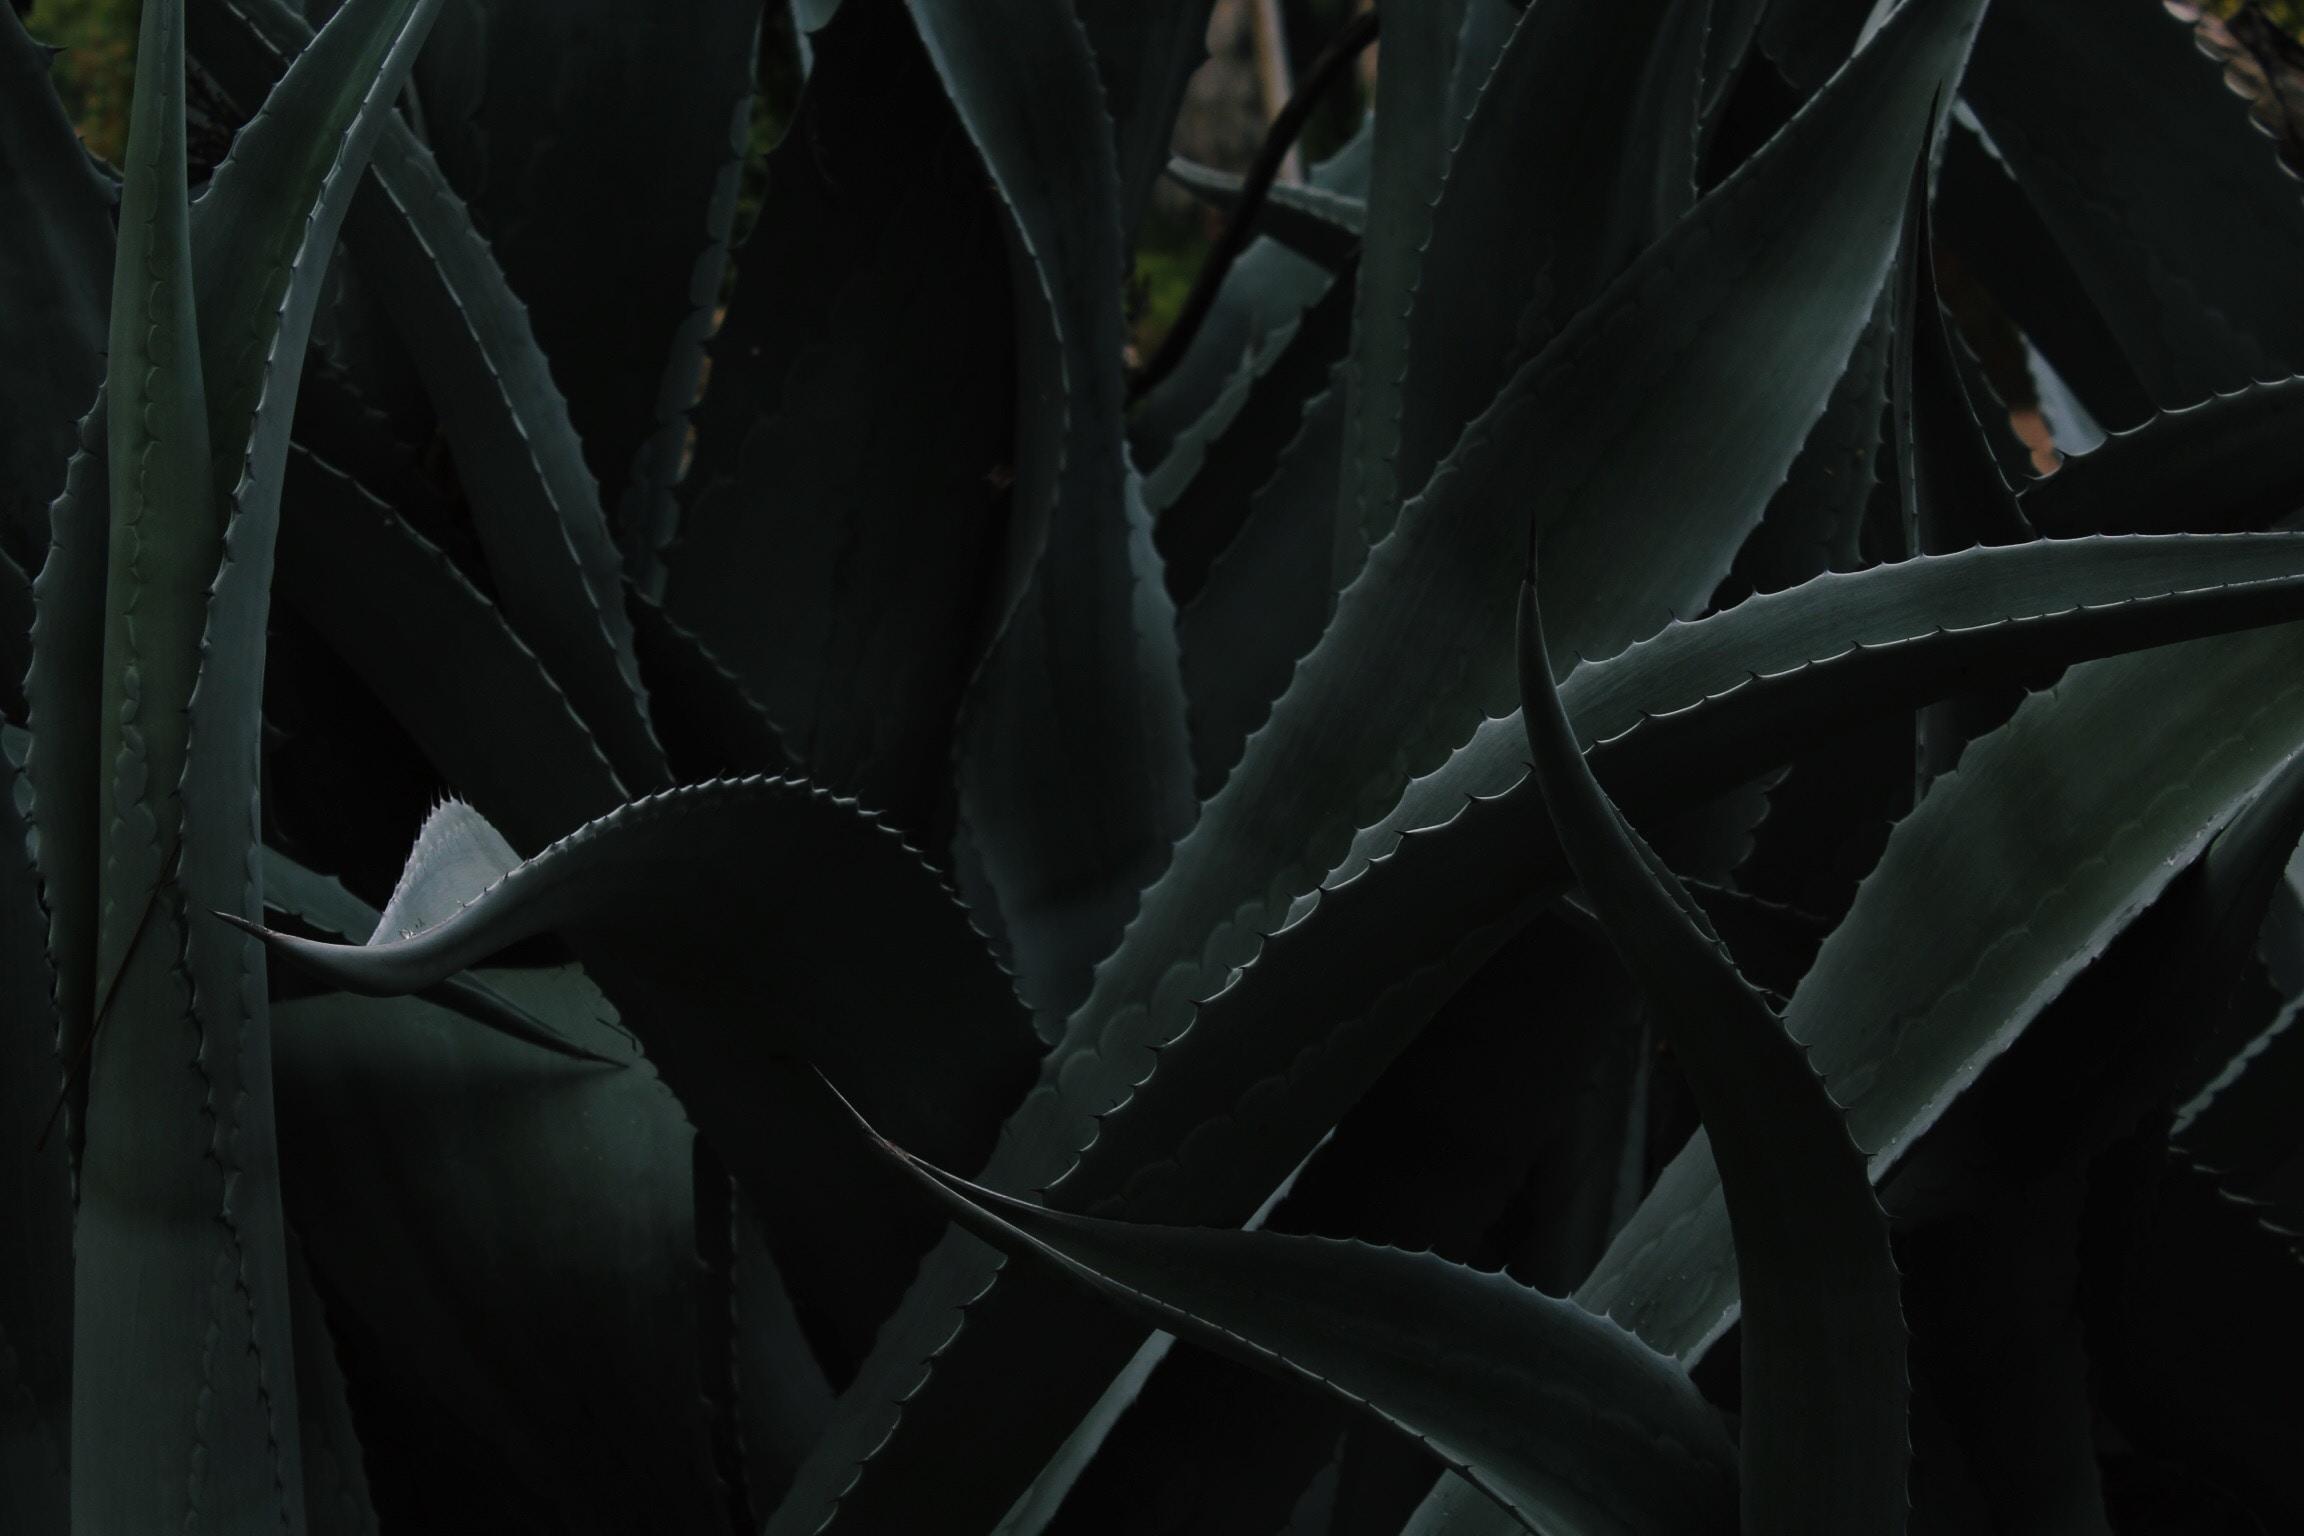 closeup photo of Aloe vera plant